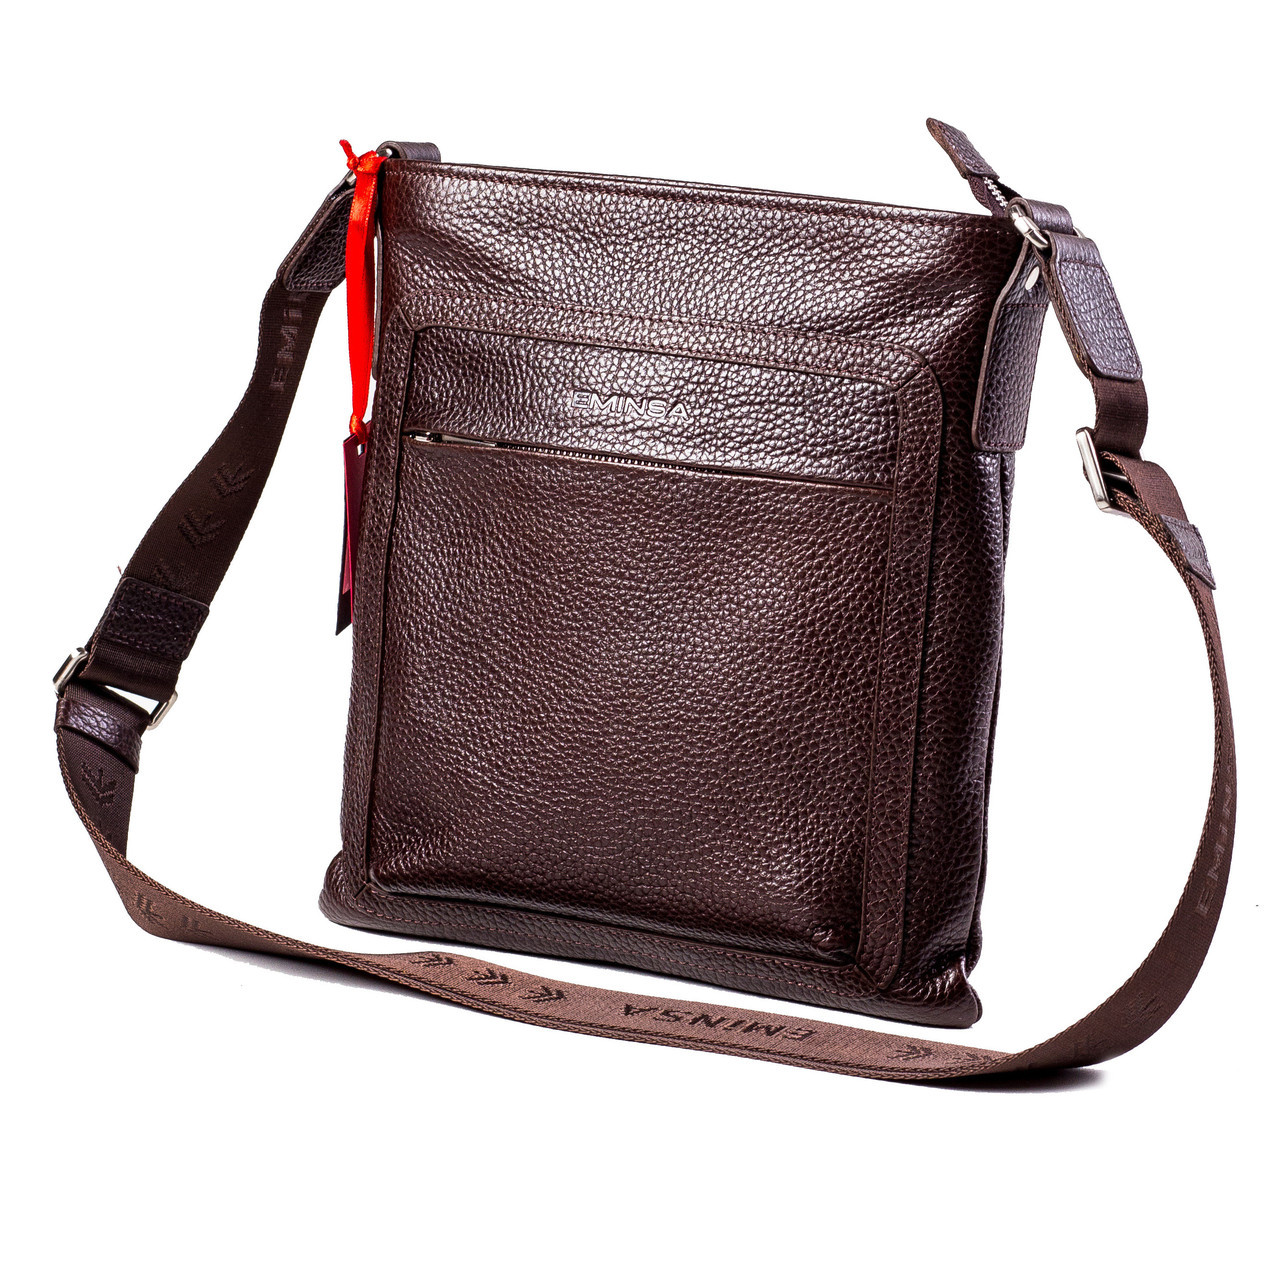 a5e5c3100b05 Мужская сумка кожаная коричневая Eminsa 6098-26-3 : продажа, цена в ...